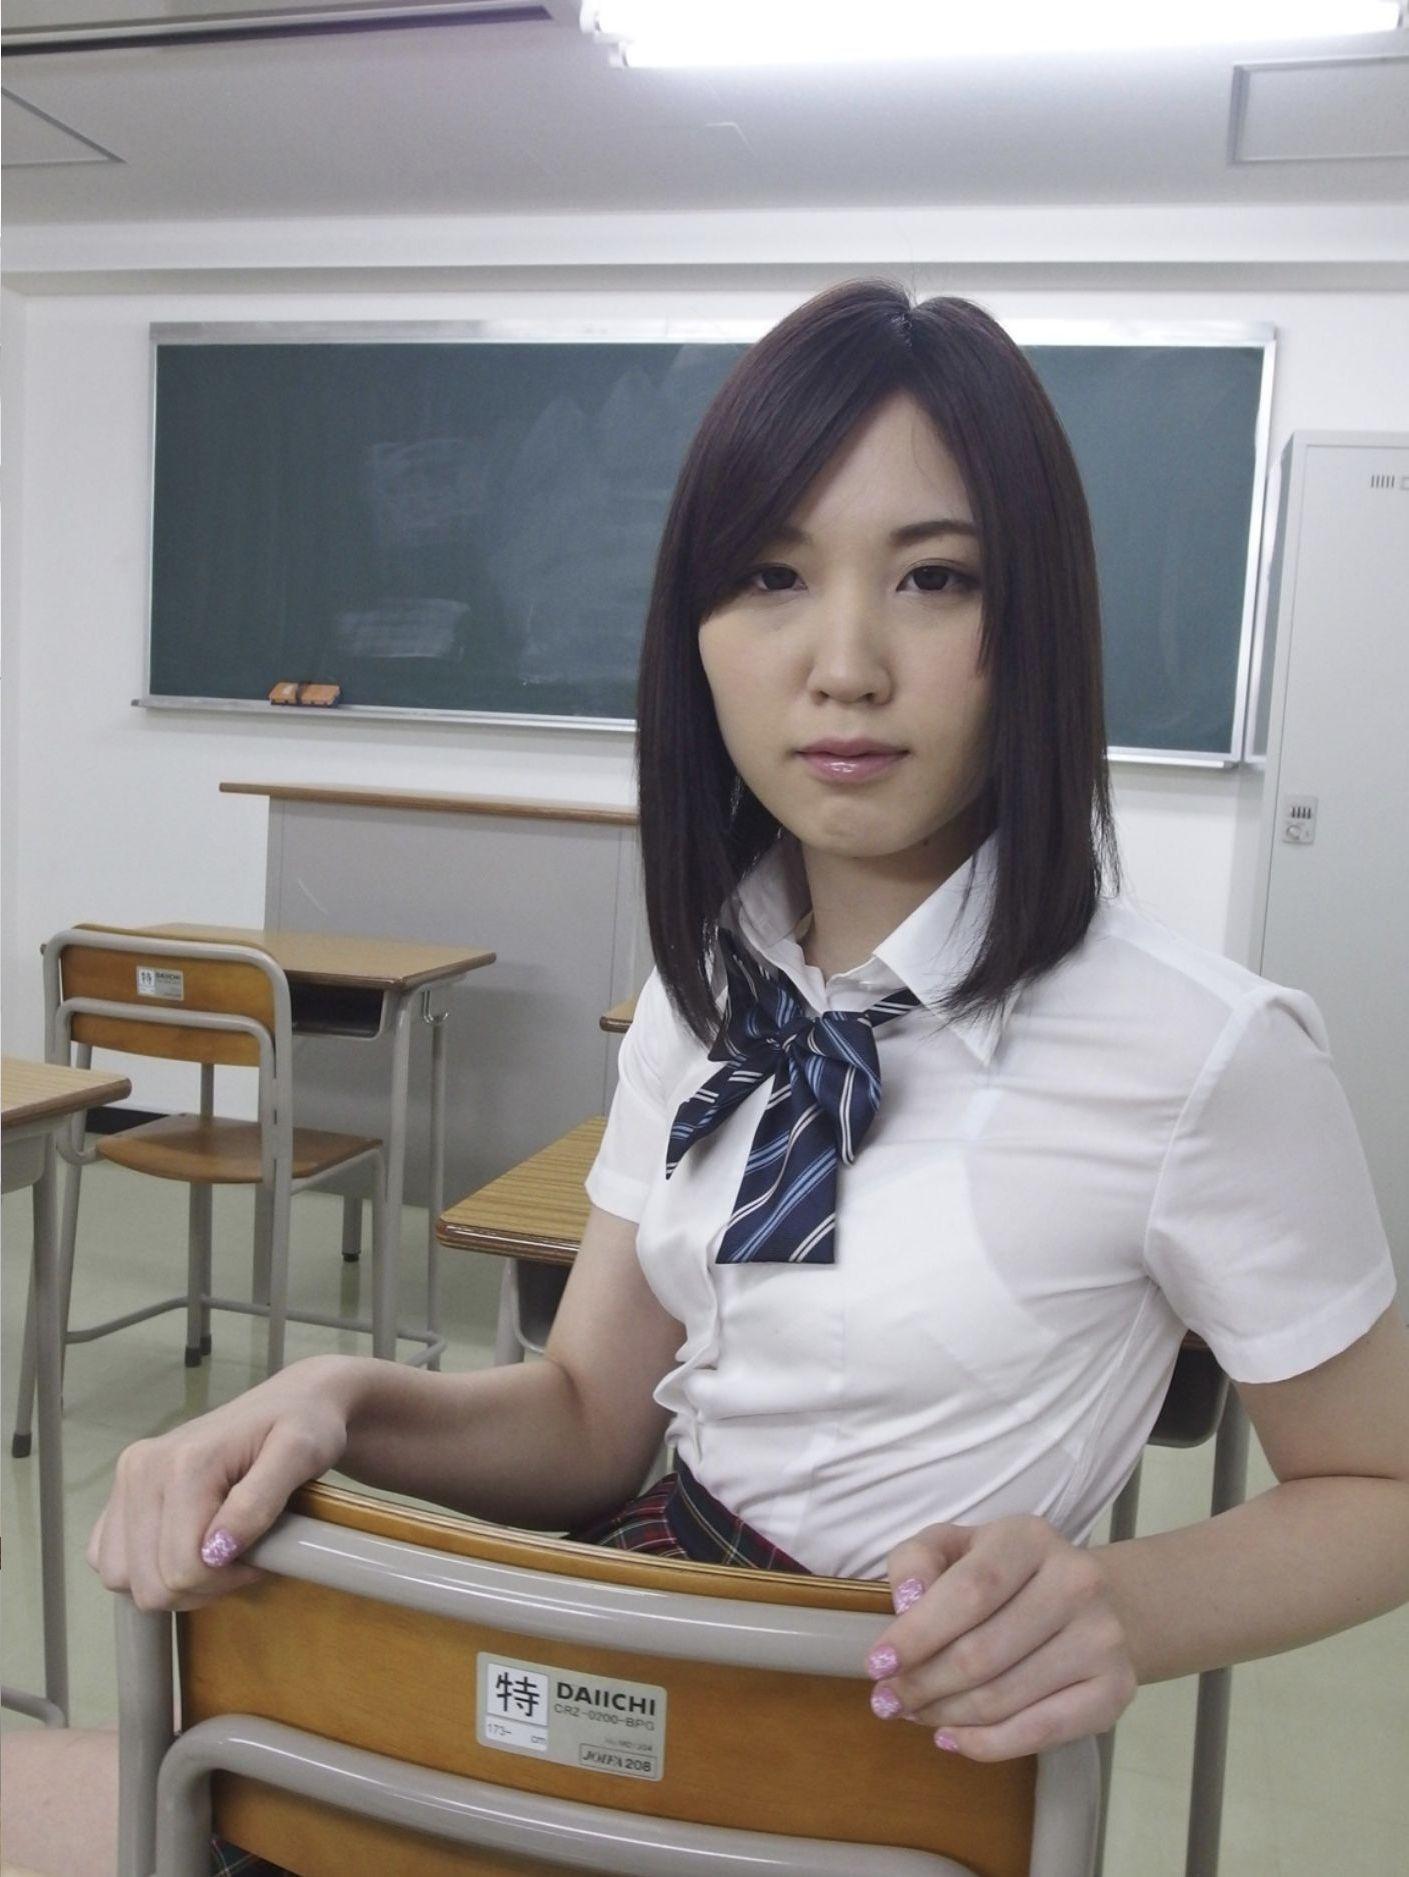 COSPLAY GIRLS 白石優杞菜 (MAXING美少女写真集)022